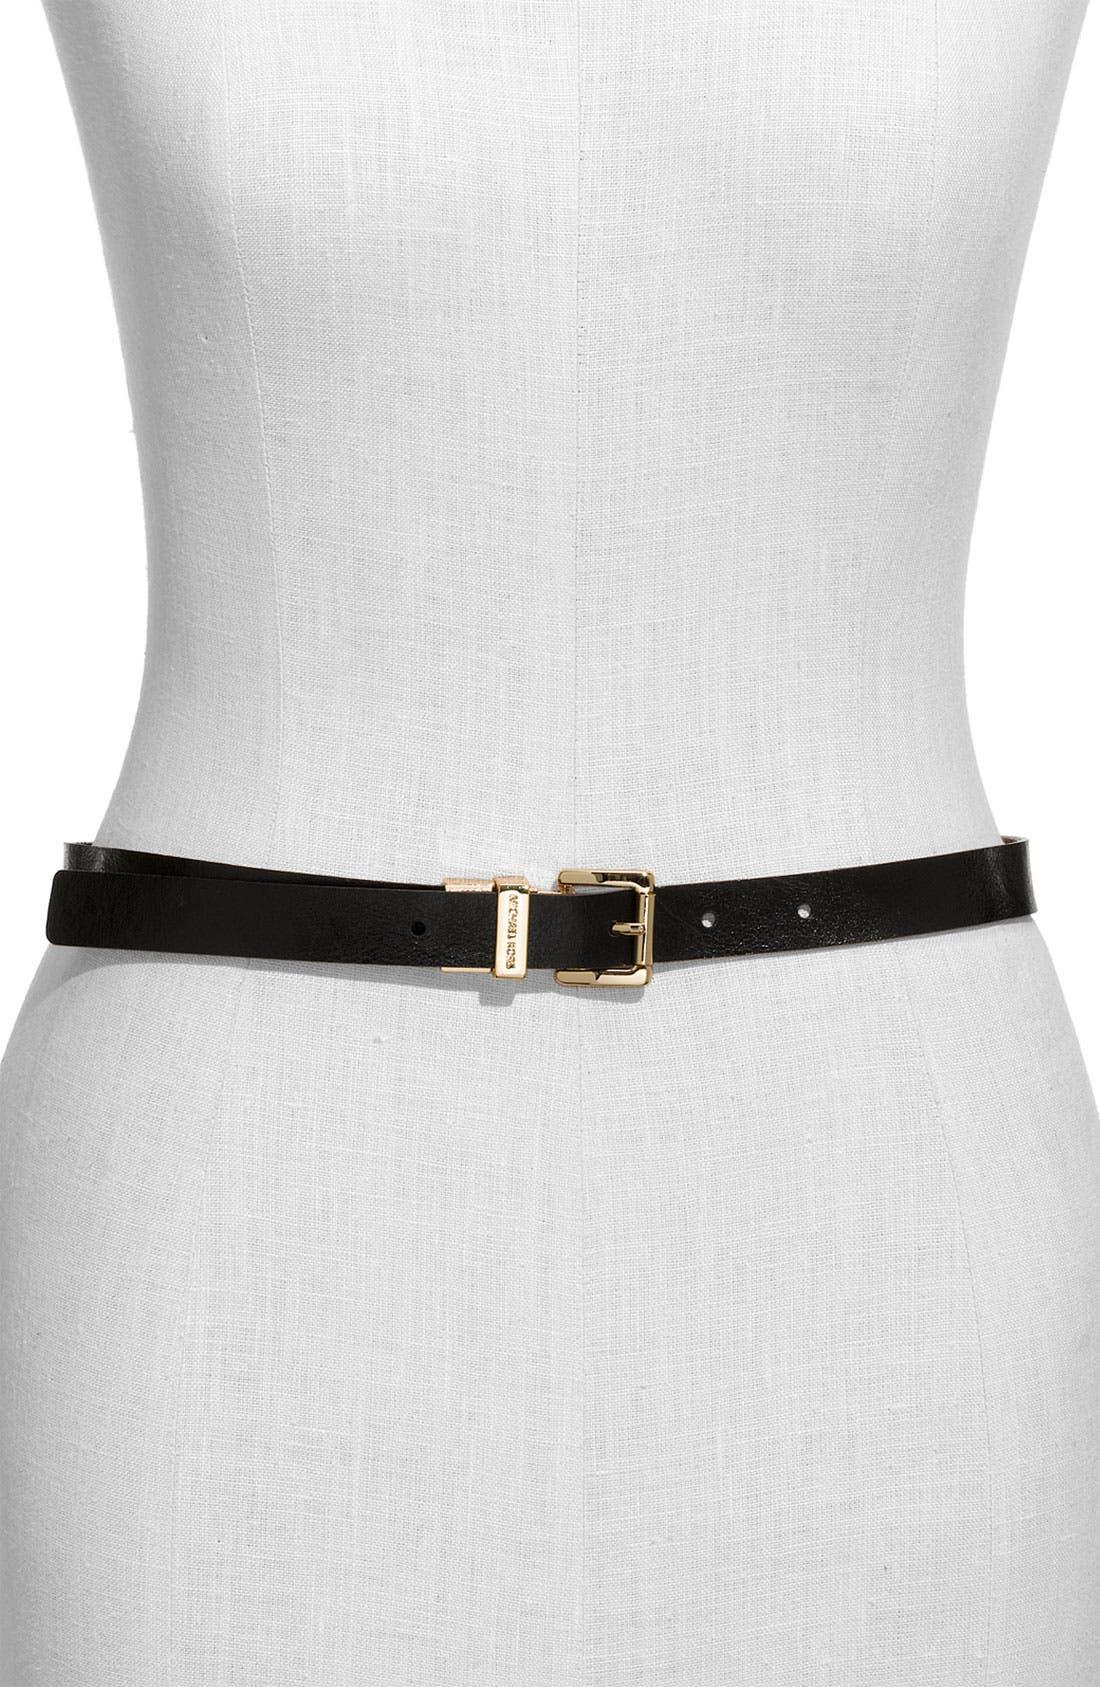 Alternate Image 2  - MICHAEL Michael Kors Reversible Leather Belt